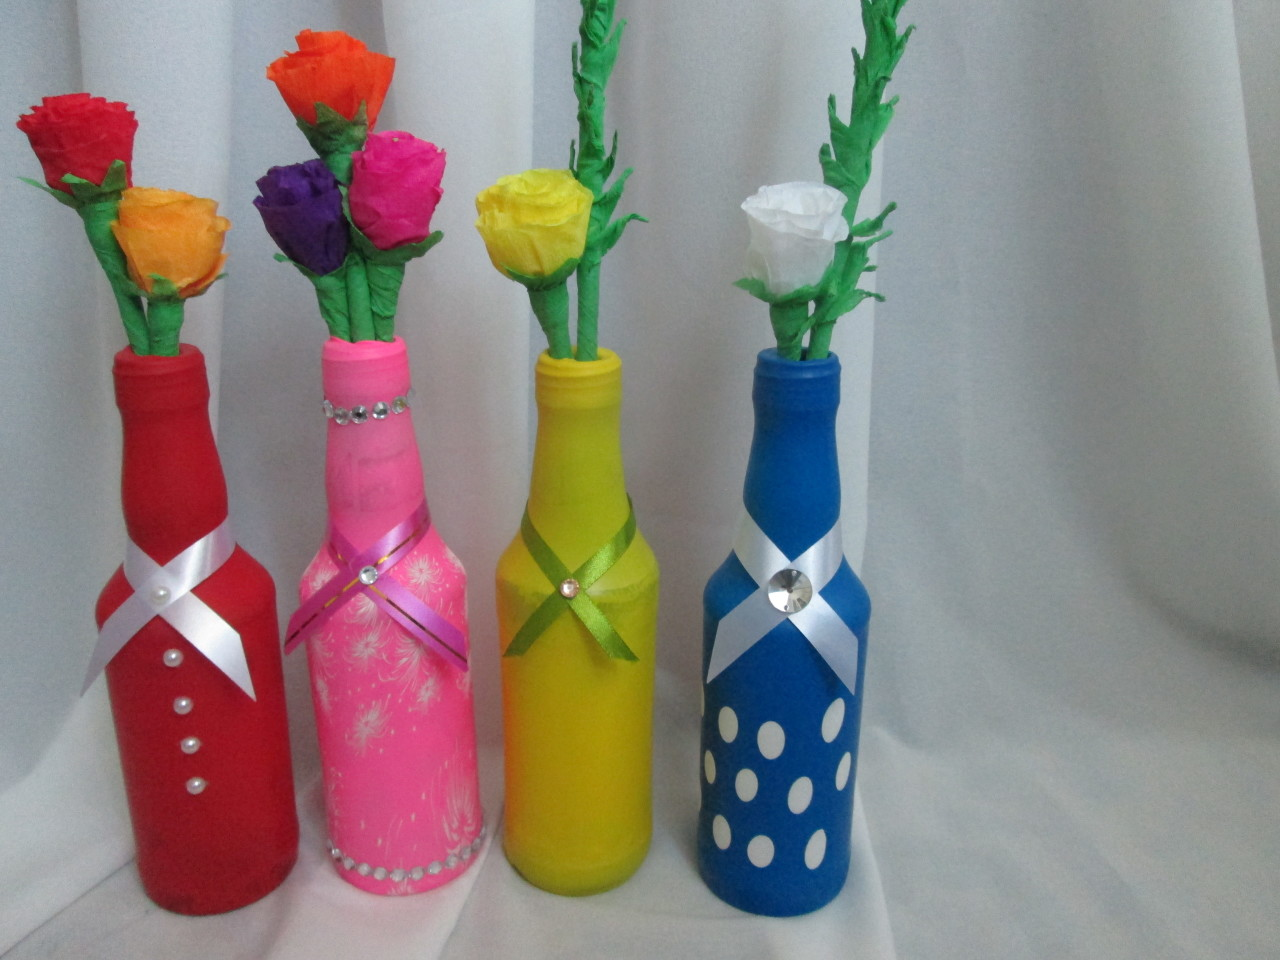 Декор бутылок воздушными шарами